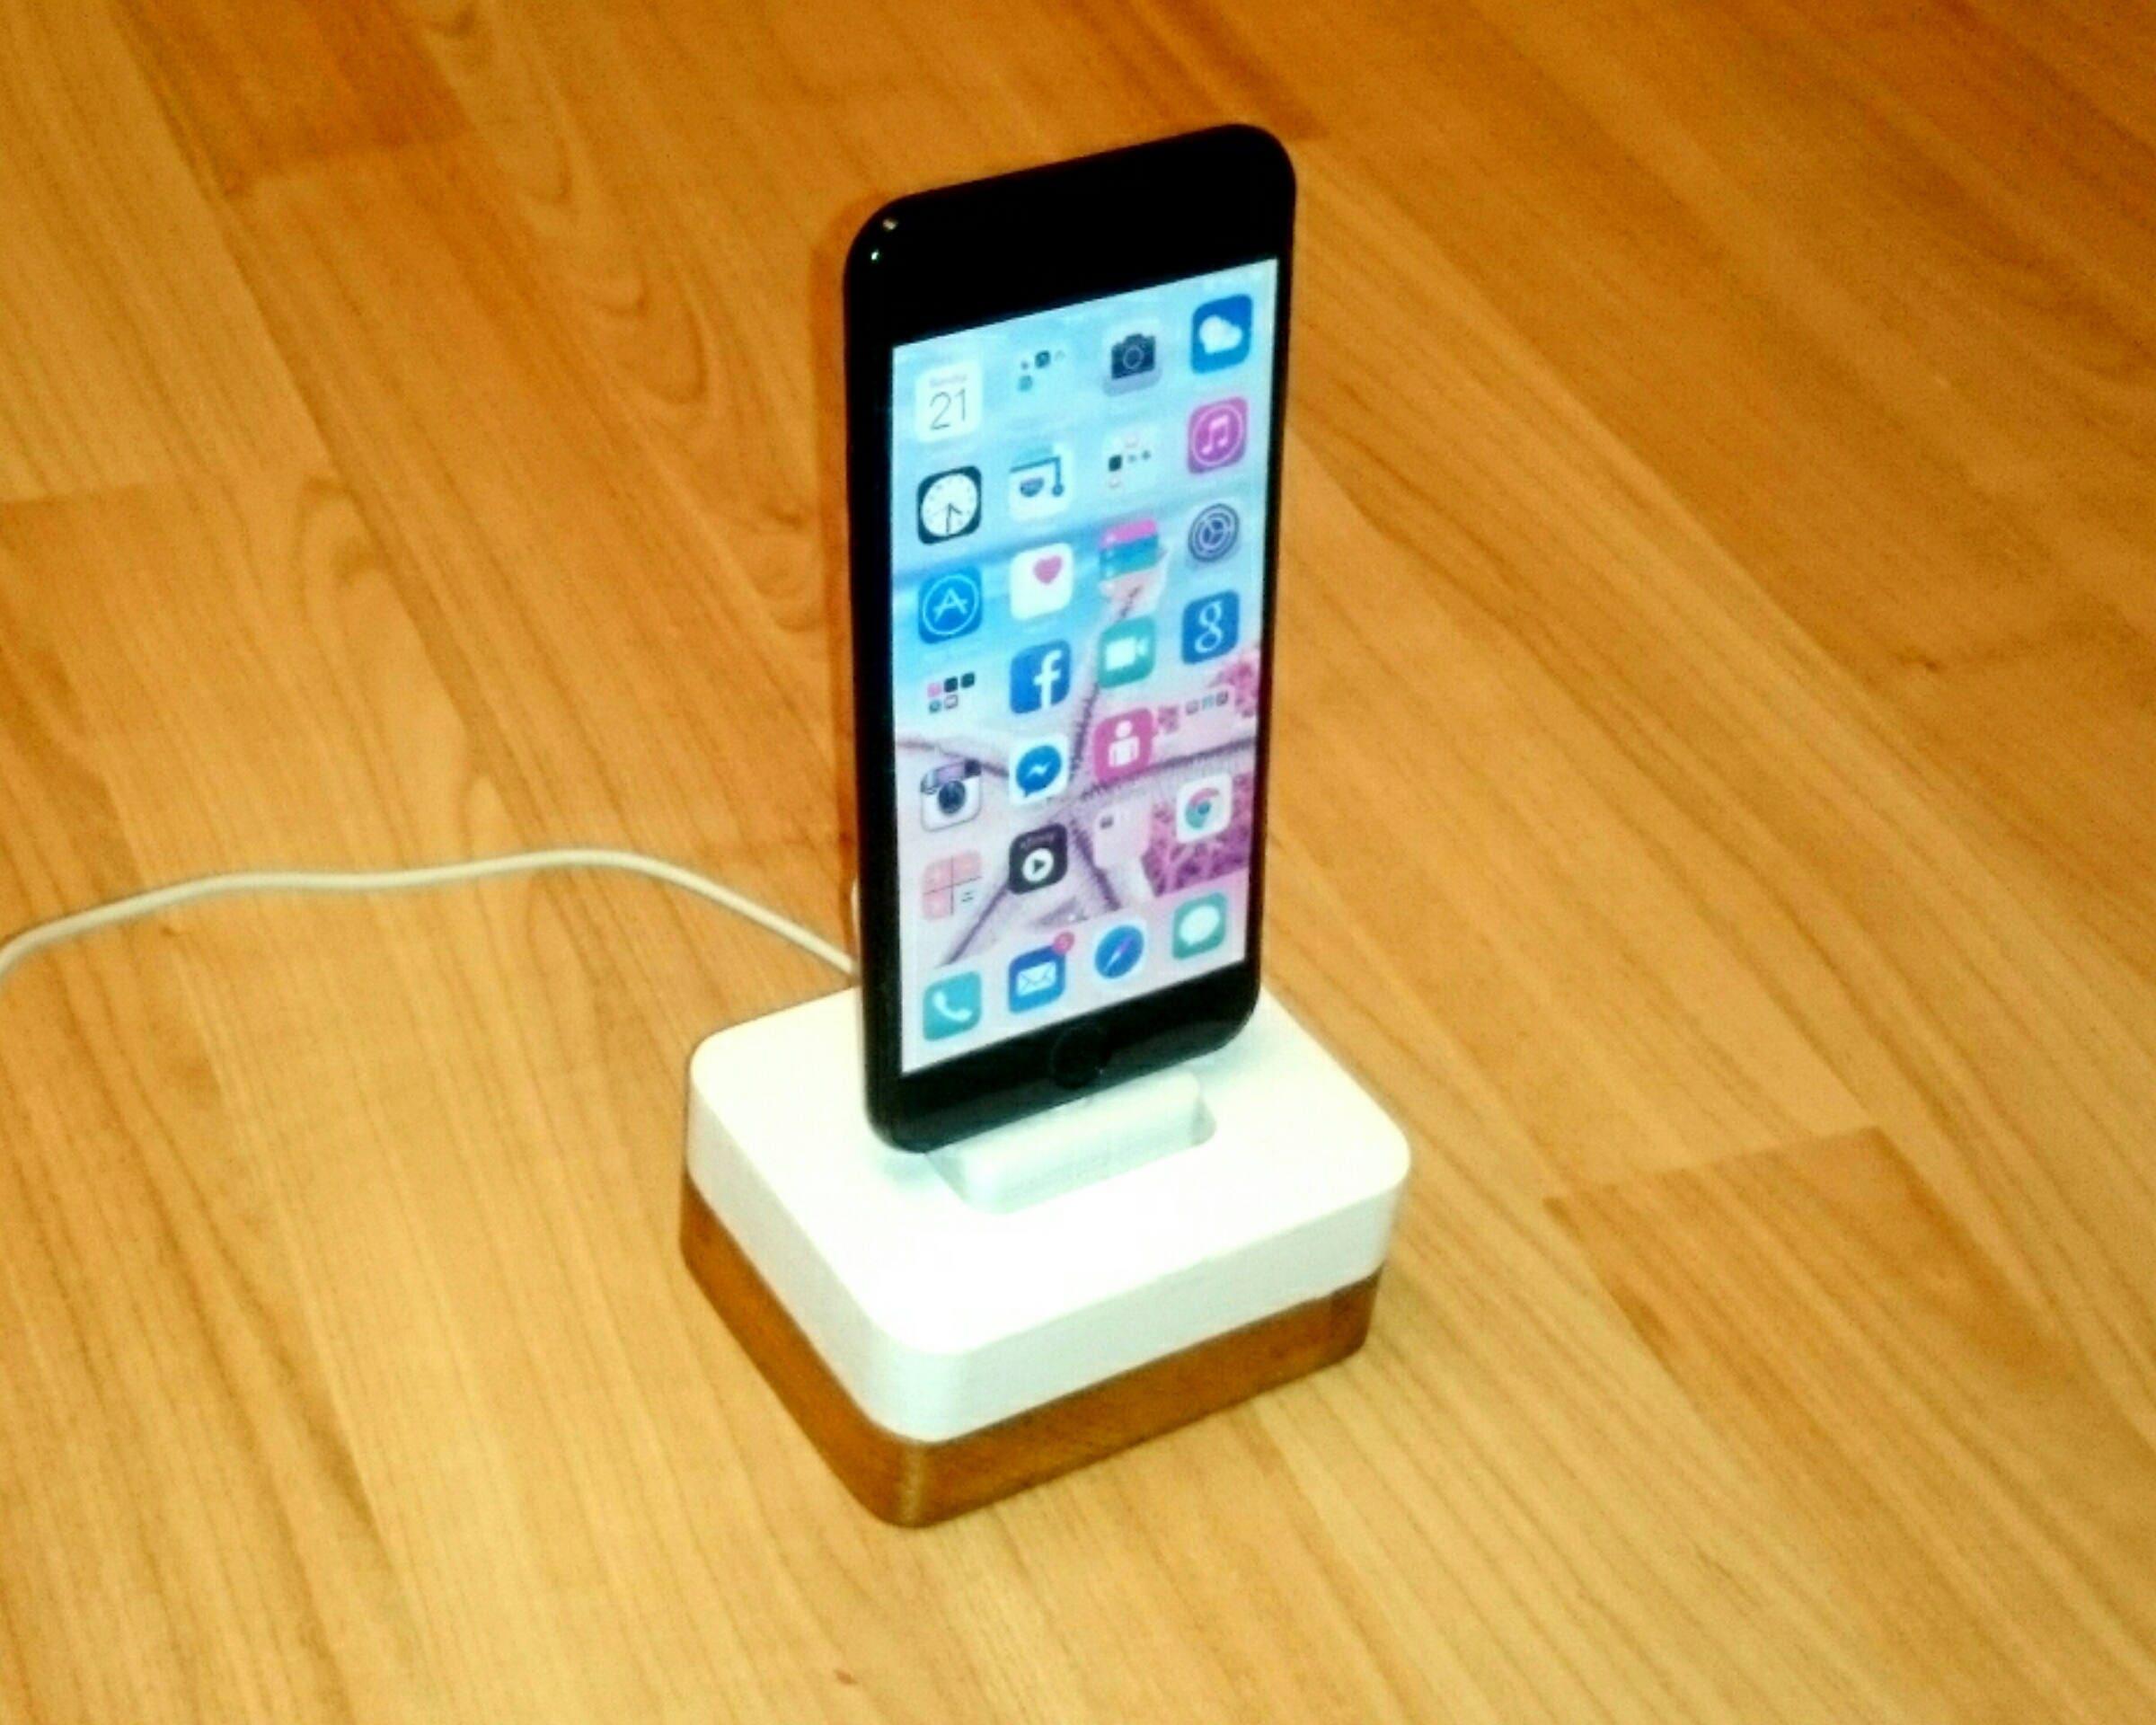 iphone ladestation docking station st nder idoqq uno wei. Black Bedroom Furniture Sets. Home Design Ideas